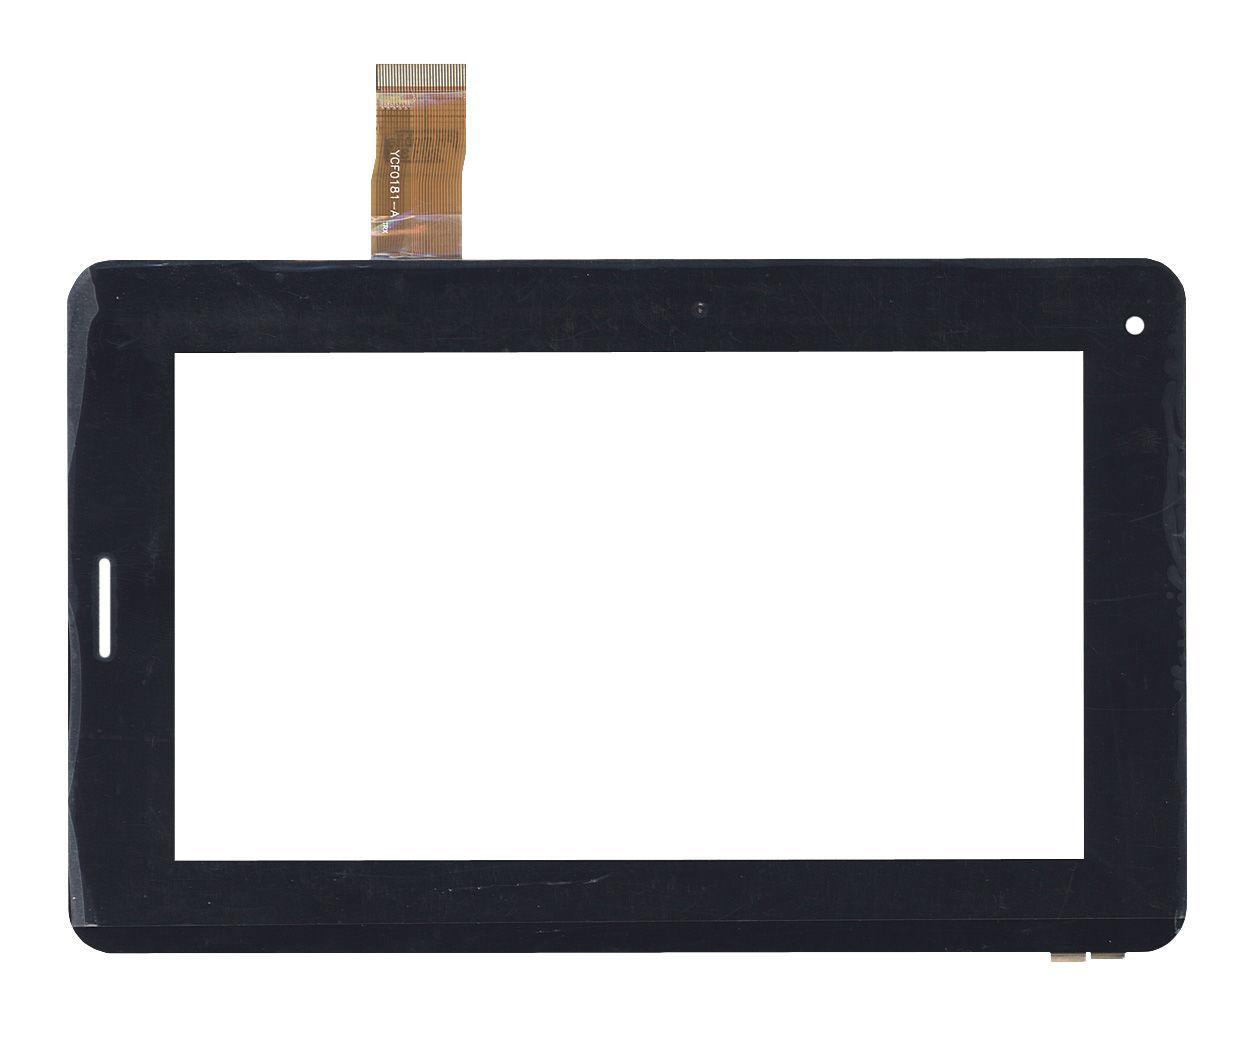 Тачскрин (Сенсорное стекло) для планшета JQFP07006A черный. размер: 190х118mm, 30 PIN